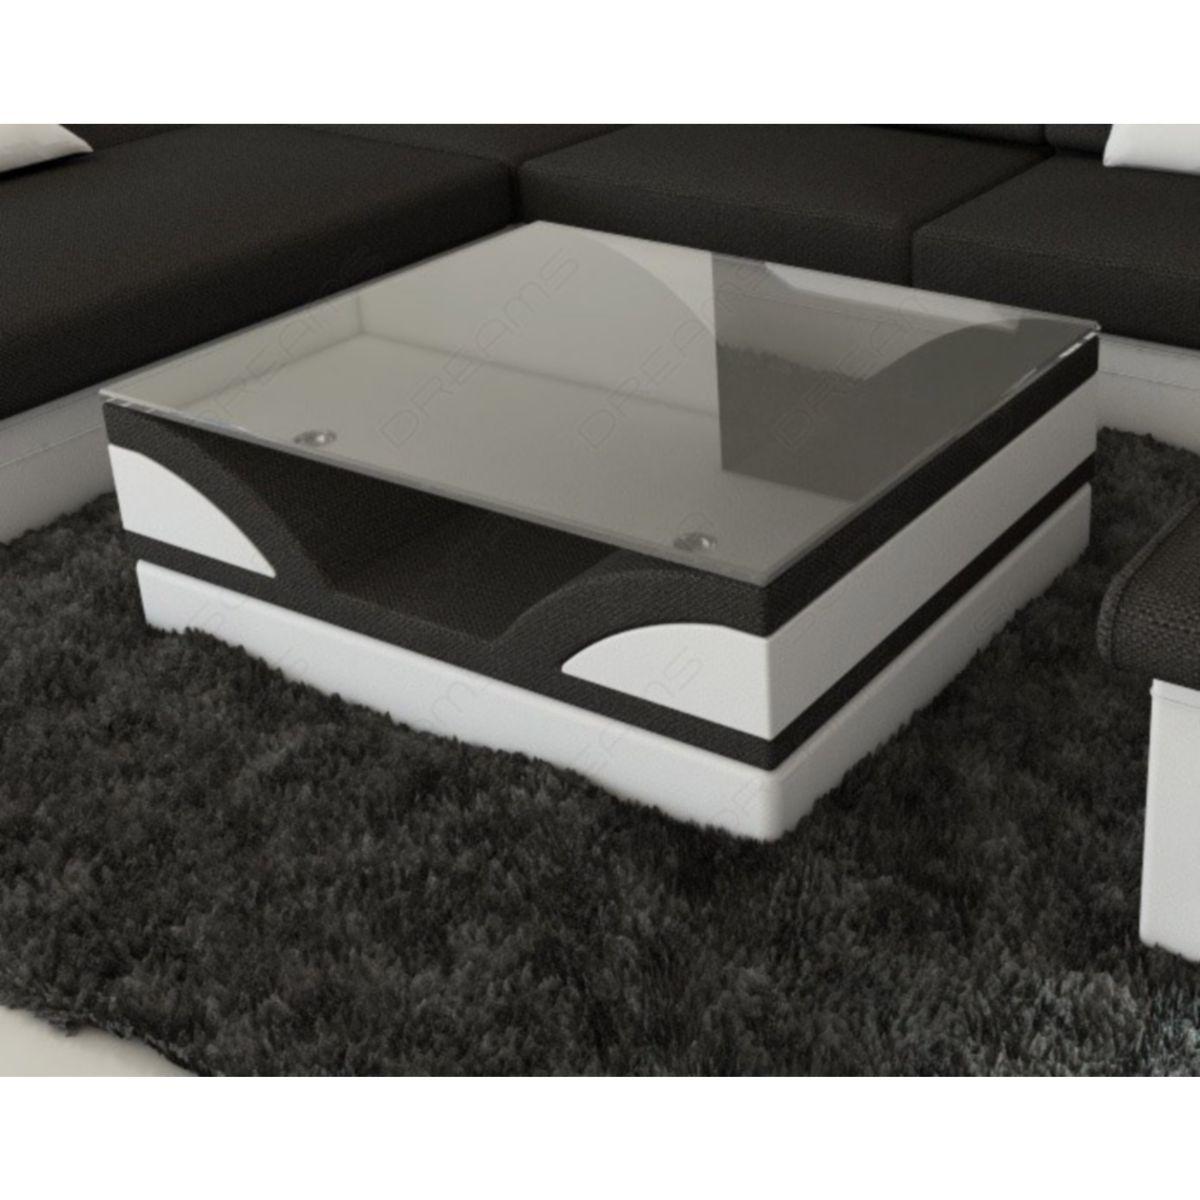 Sofa Dreams Stoff Couchtisch Monza